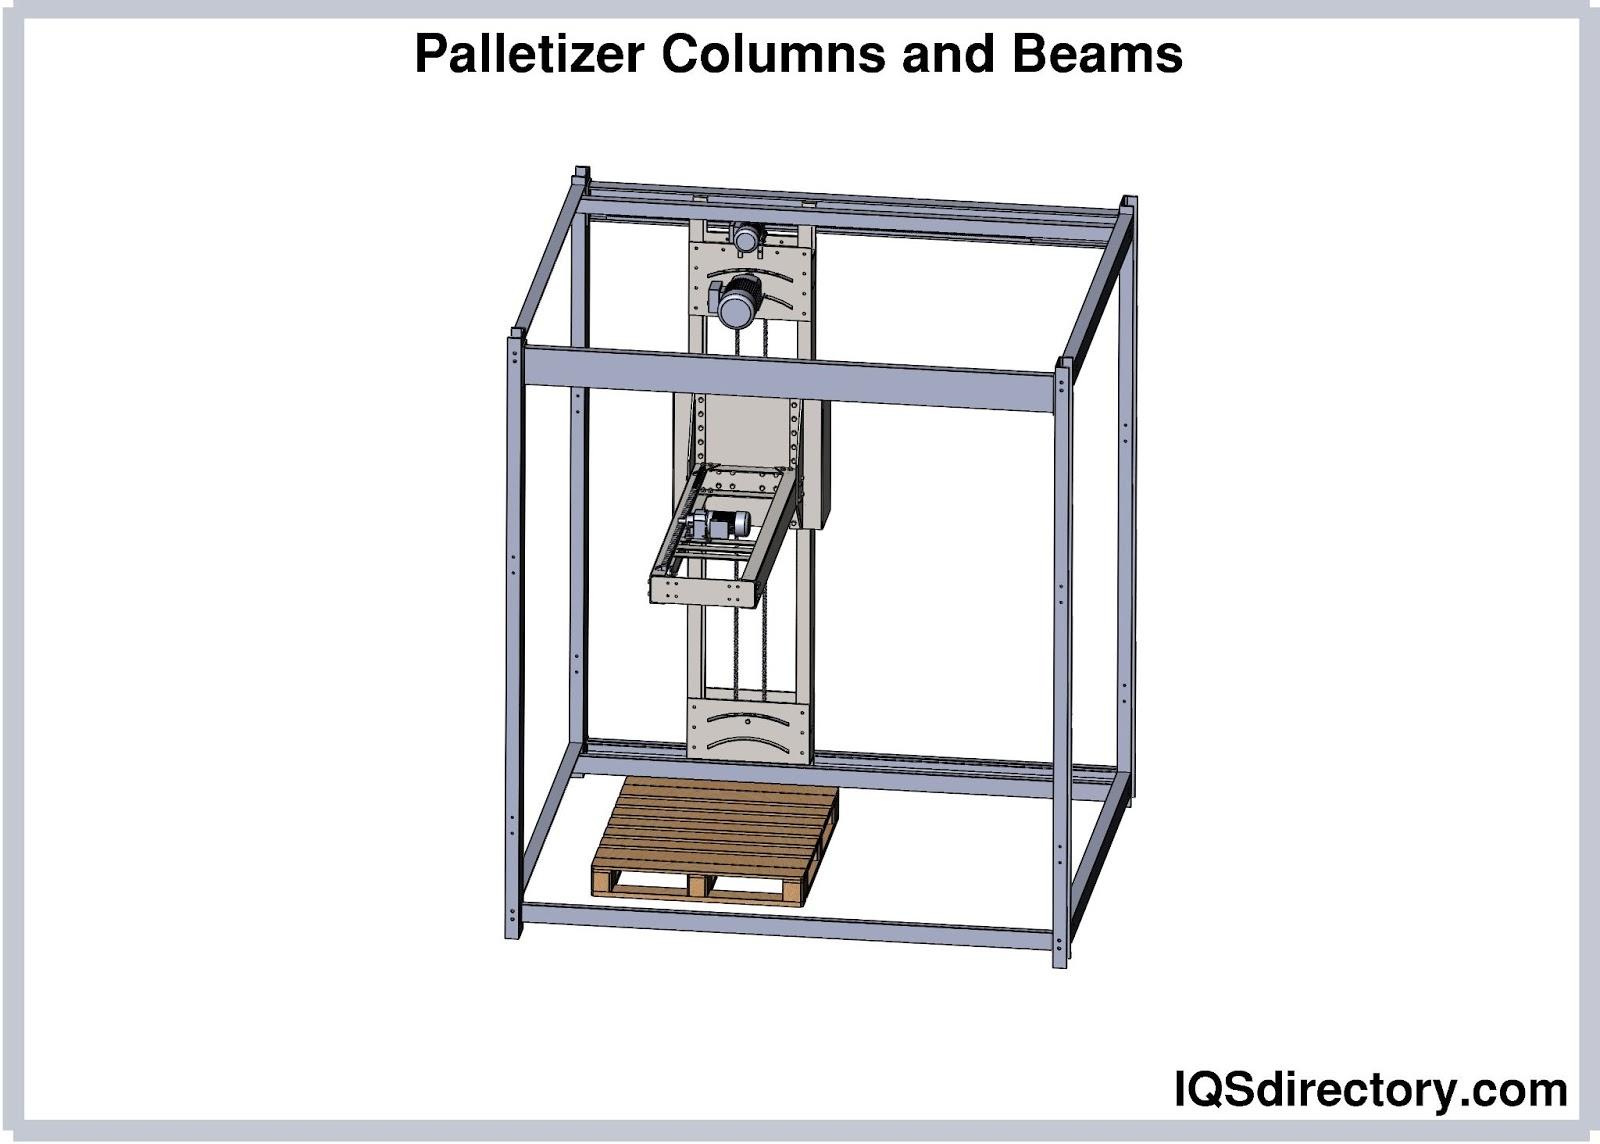 Palletizer Columns and Beams